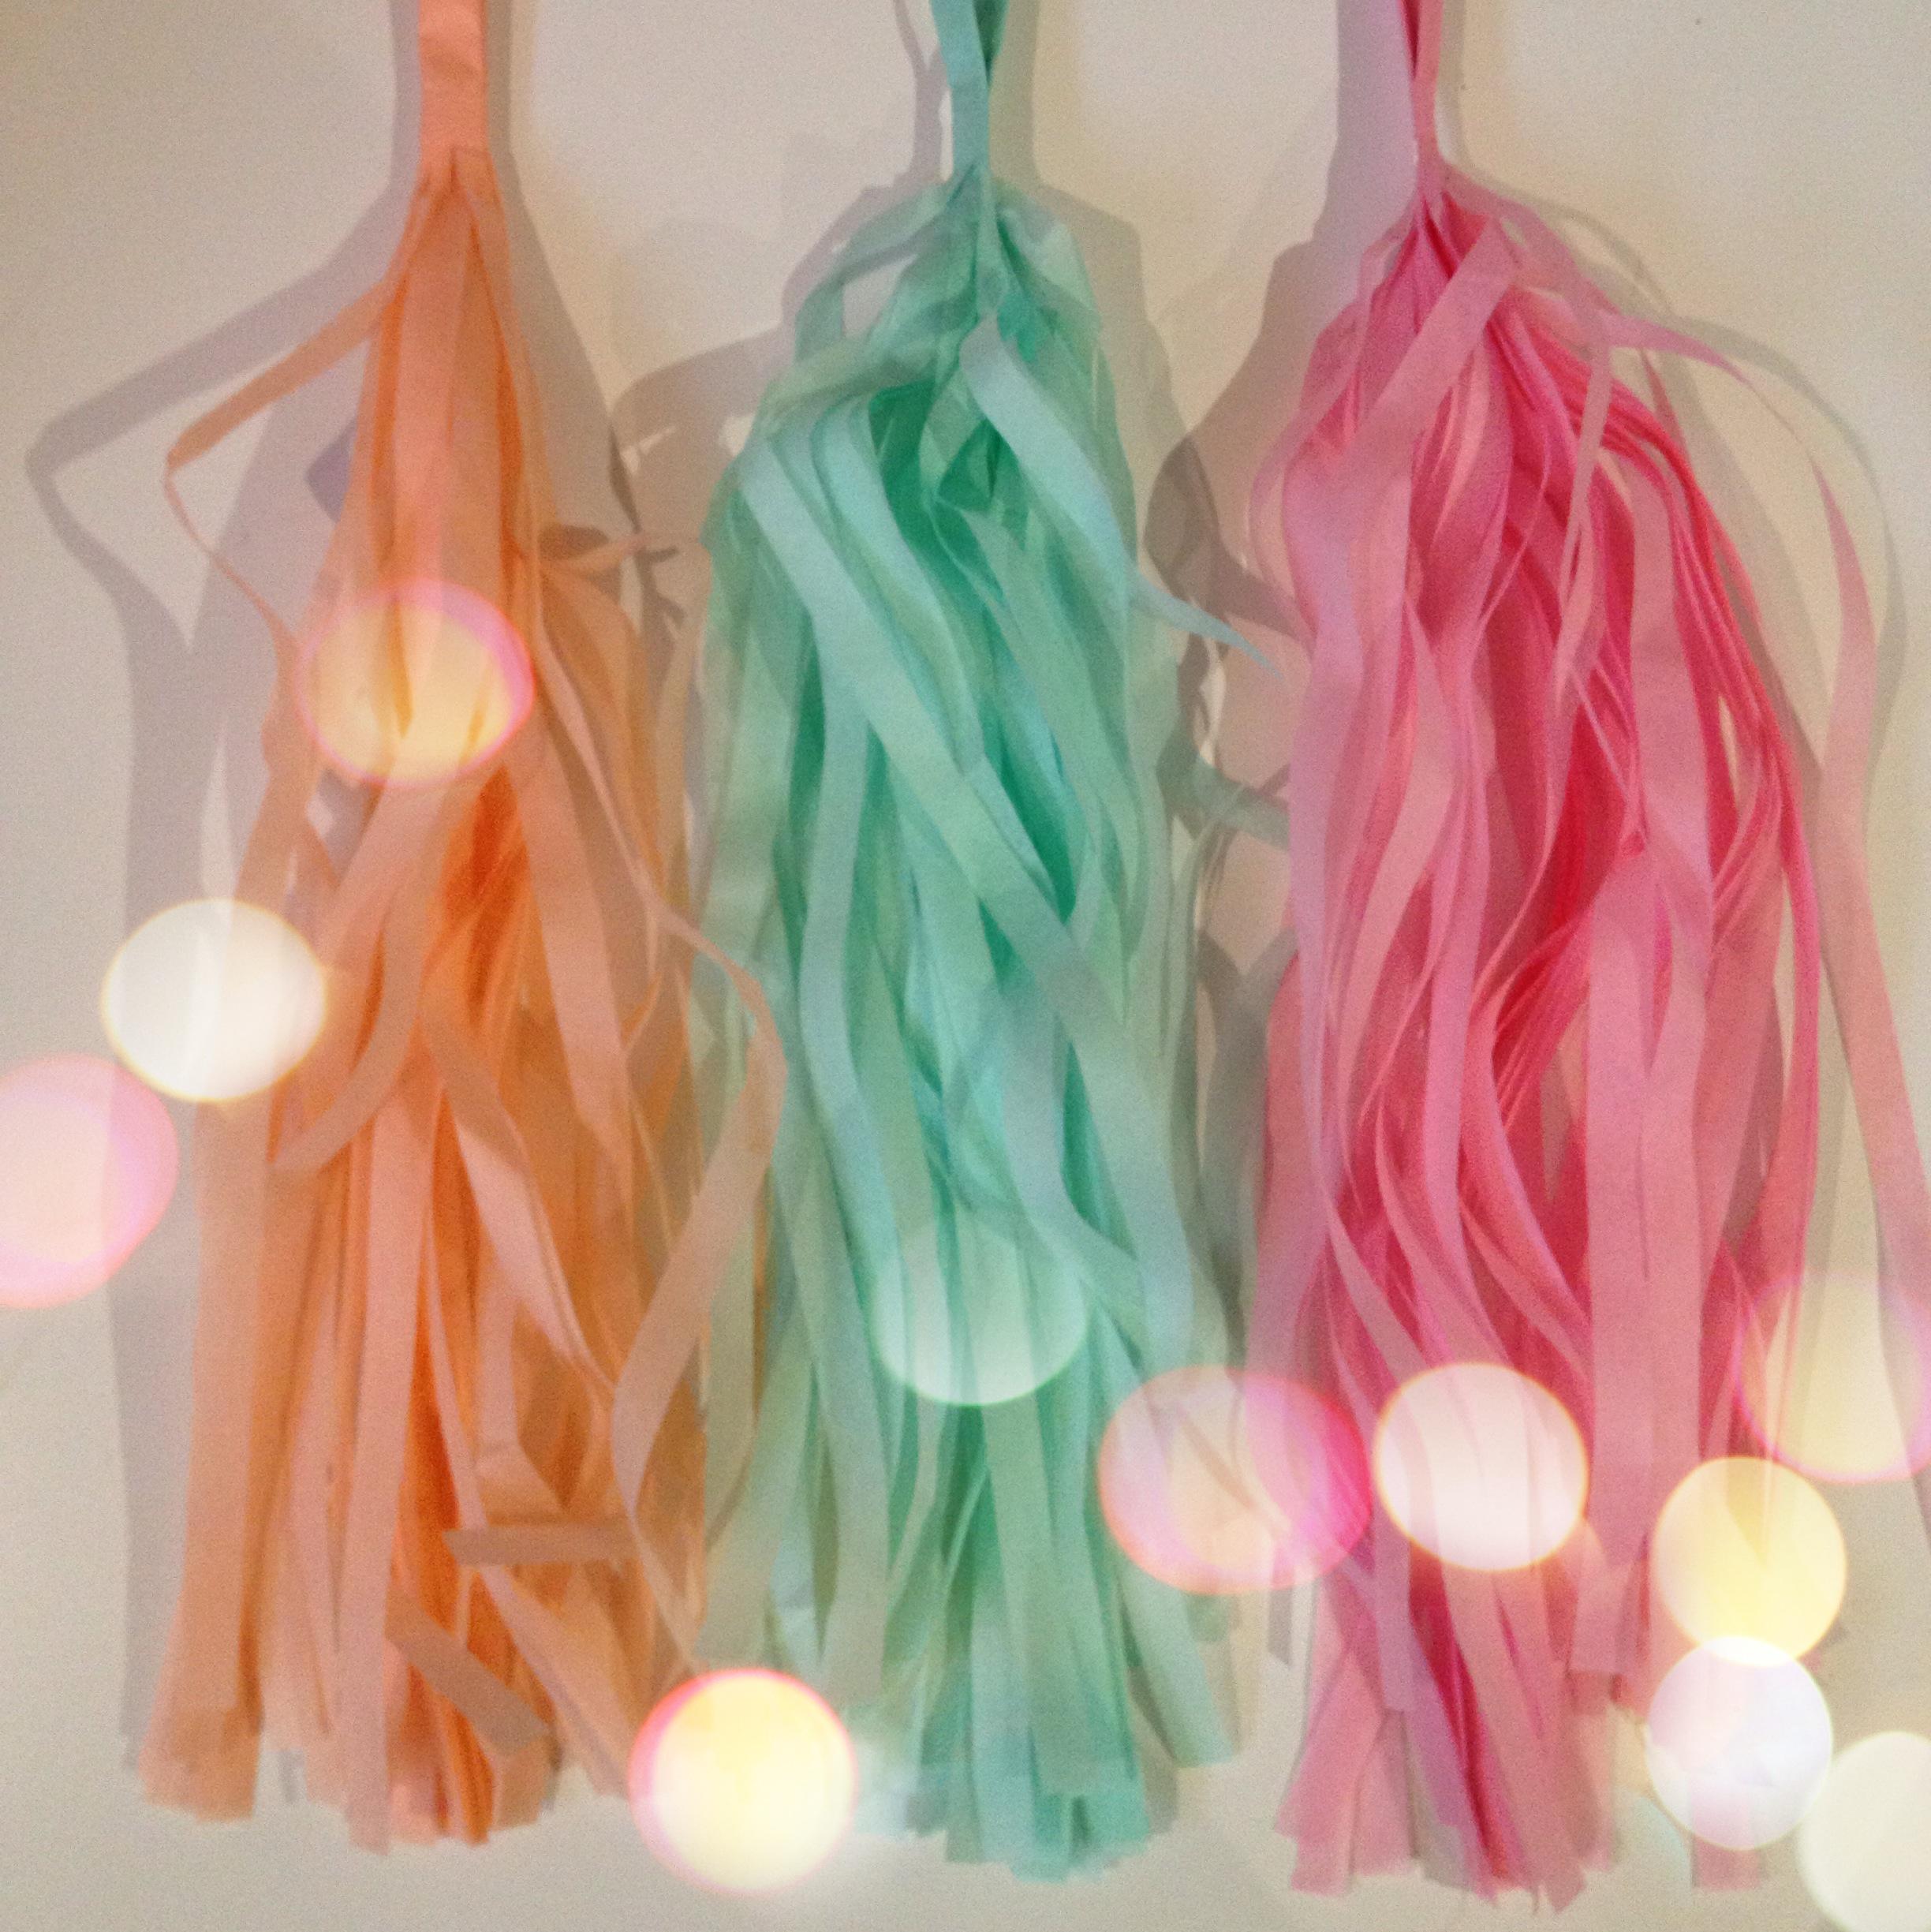 Oui Oui-guirnalda flecos-guirnalda tassel-guirnalda borlas papel-melocoton-rosa-mint con luces